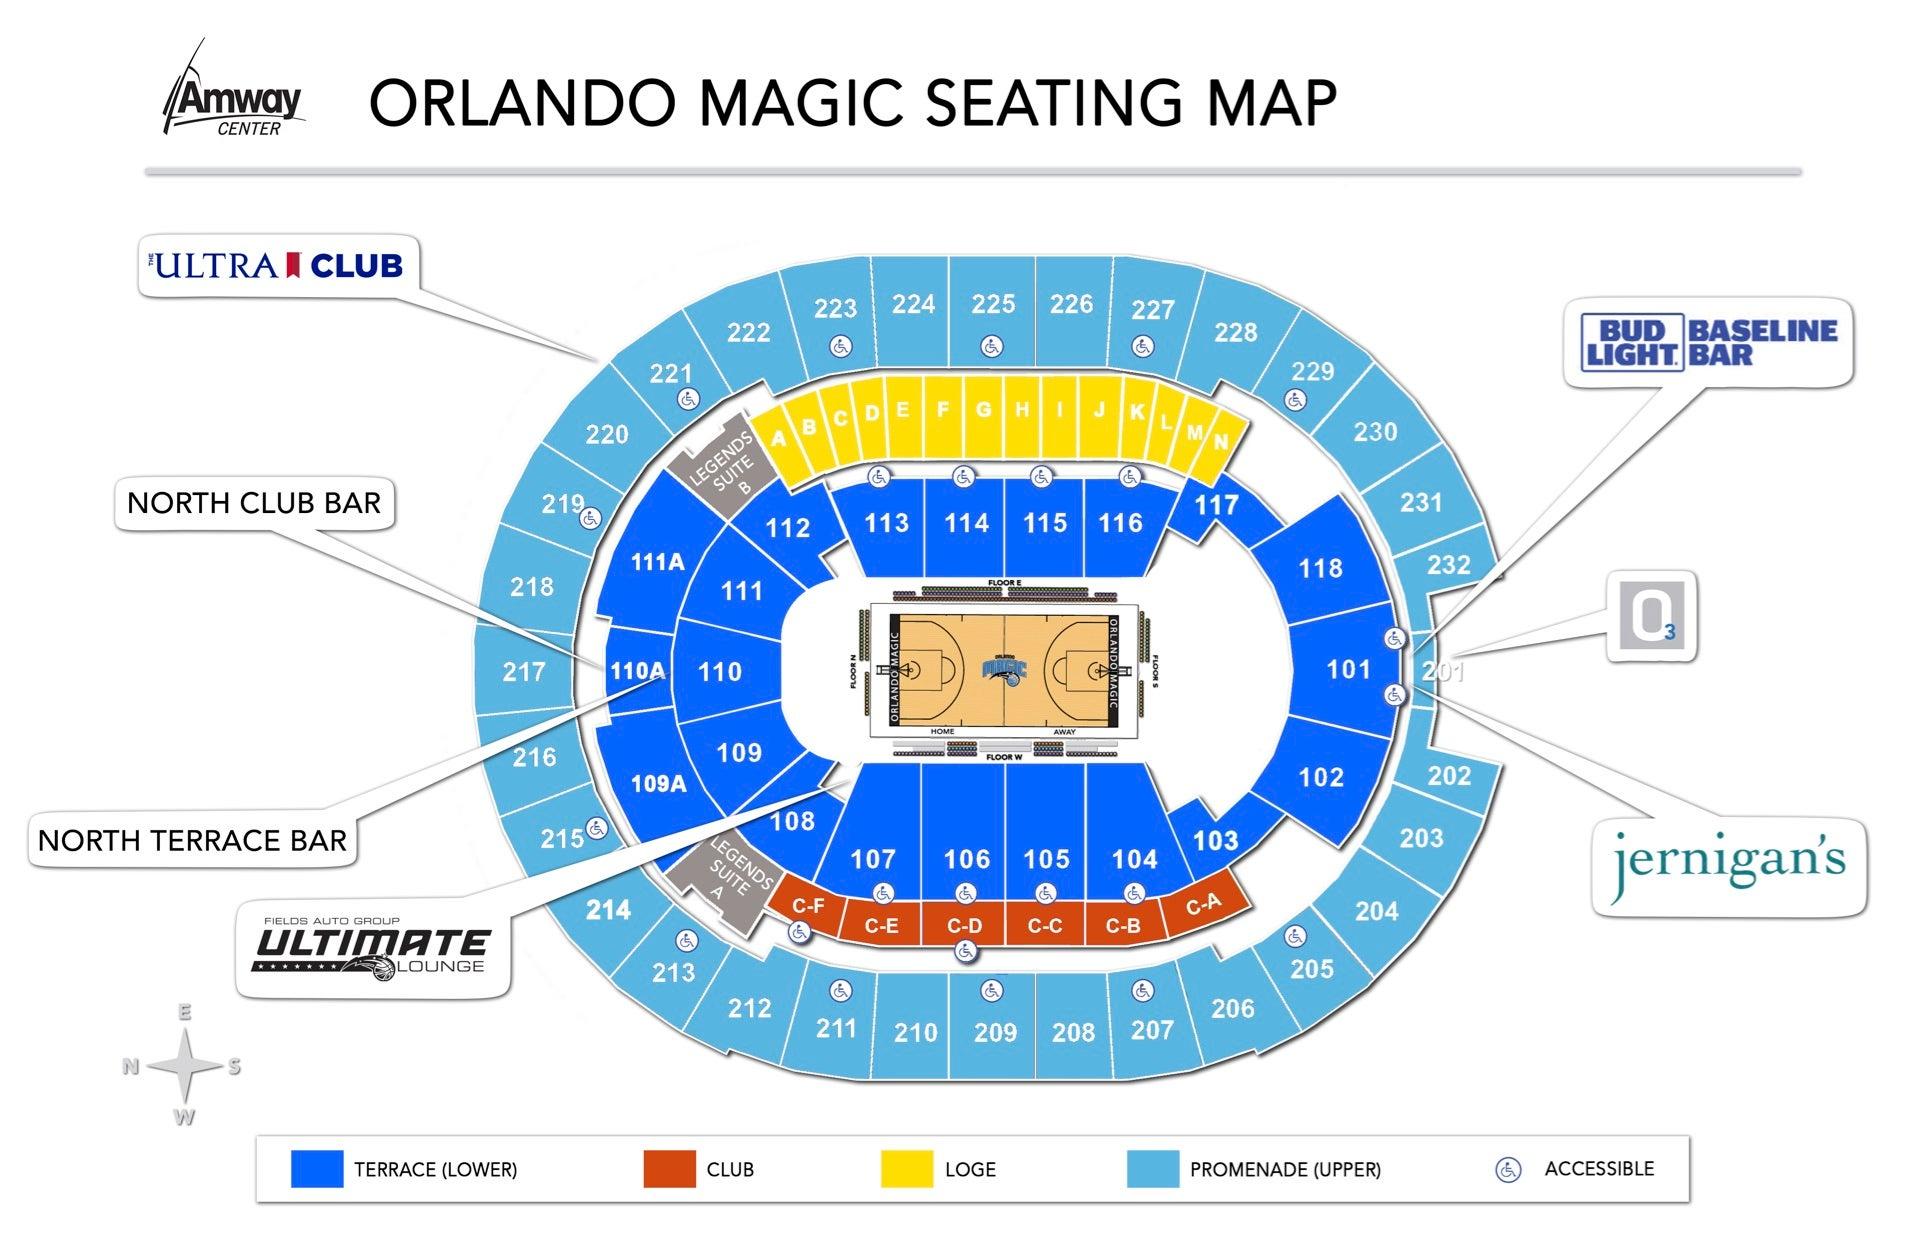 Orlando Magic Seating Map